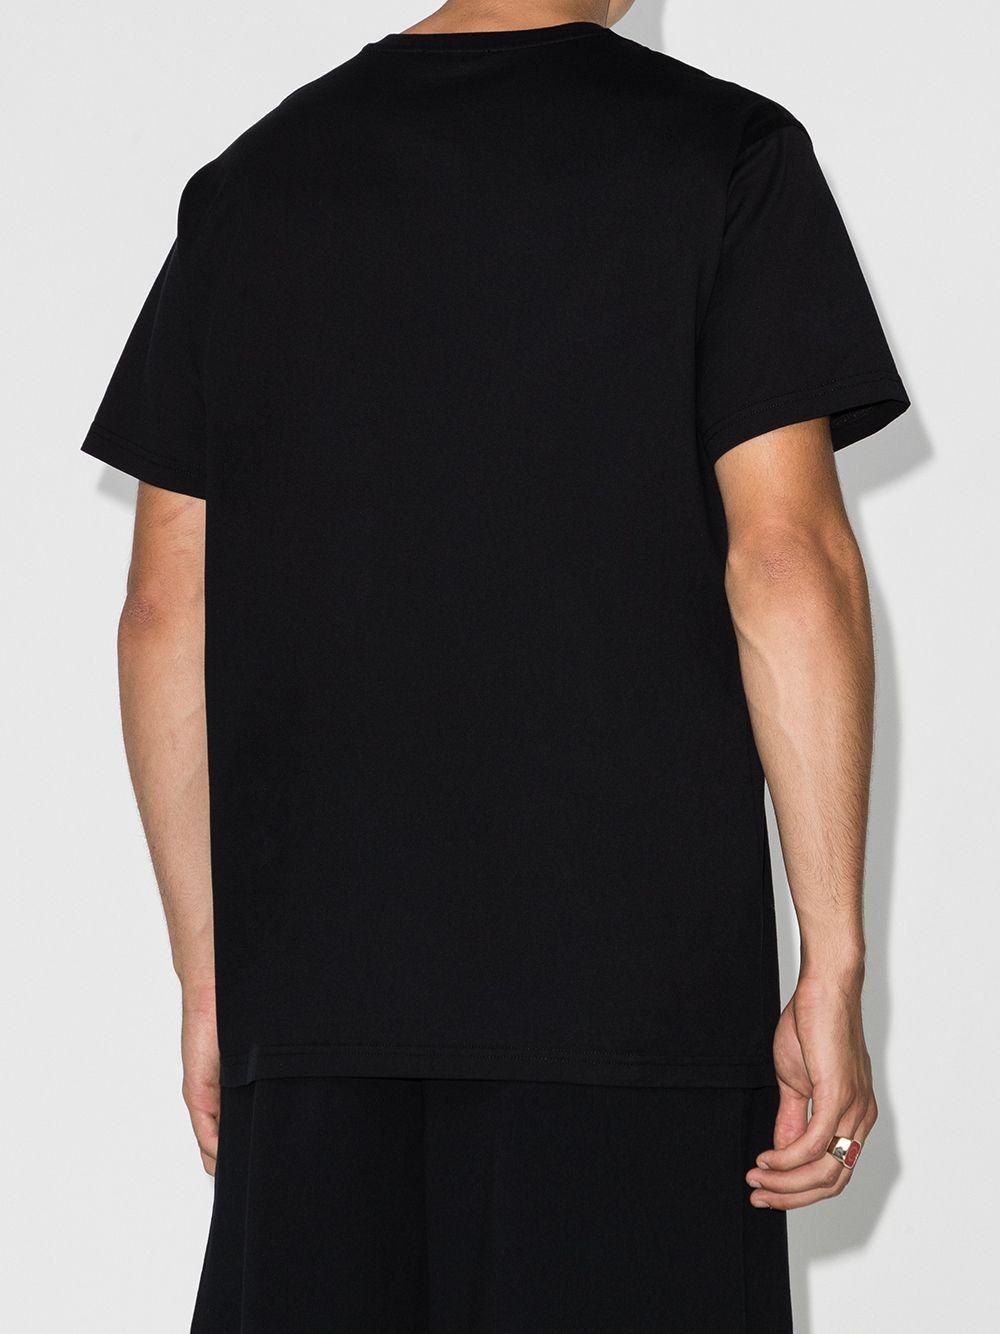 T-shirt nera con stampa multicolor Givenchy GIVENCHY   T-shirt   BM70YQ3002001